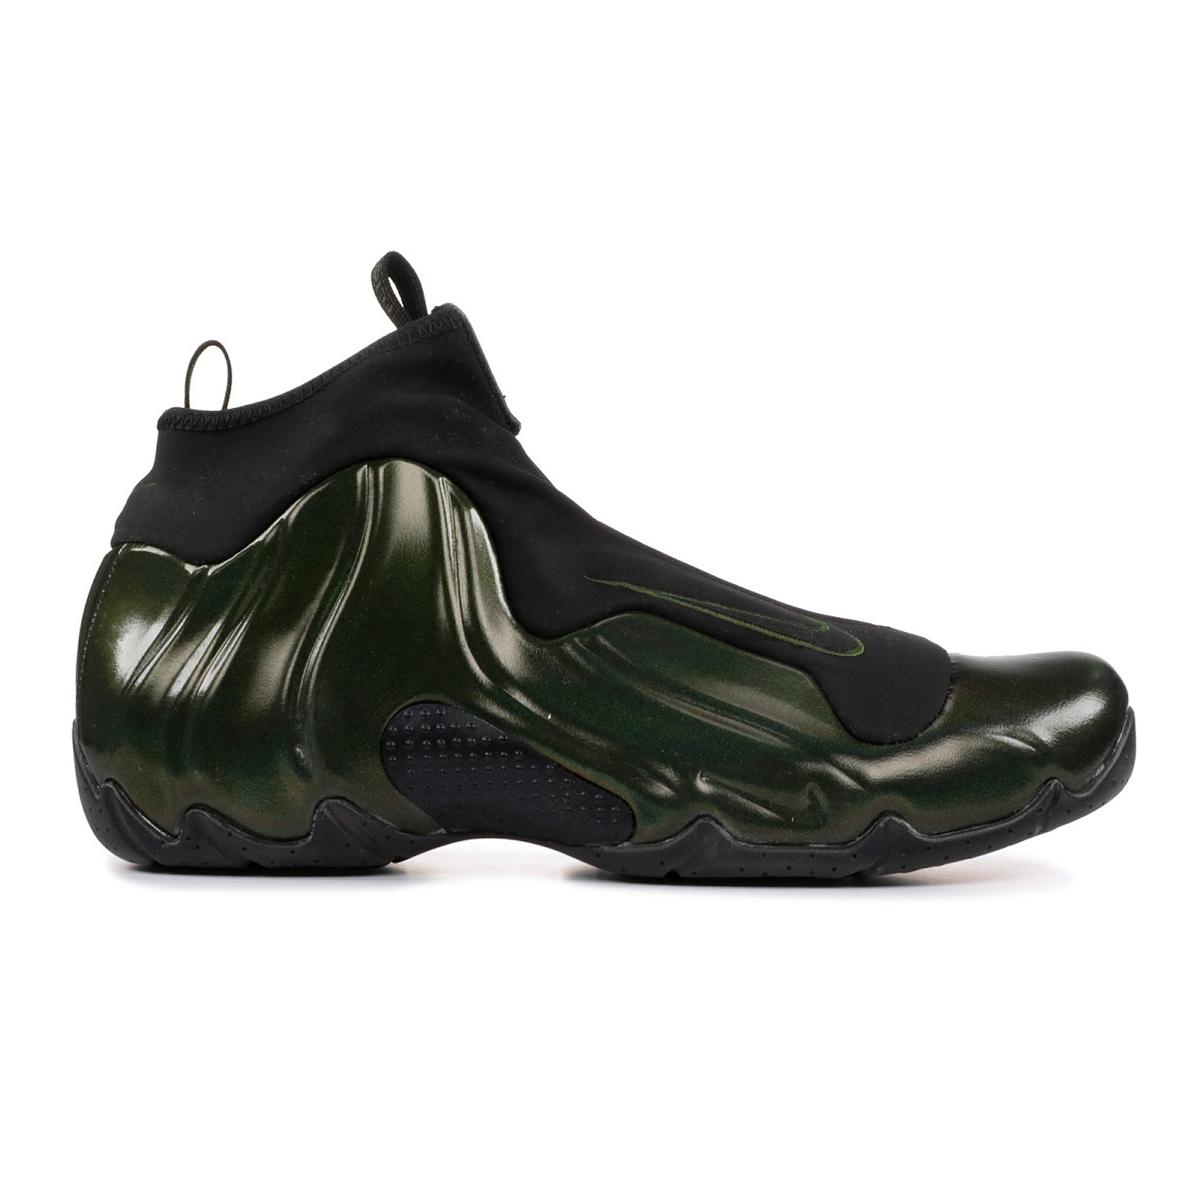 f720759cd24a Nike Air Flightposite (Legion Green  Black) and 50 similar items. 804252 01